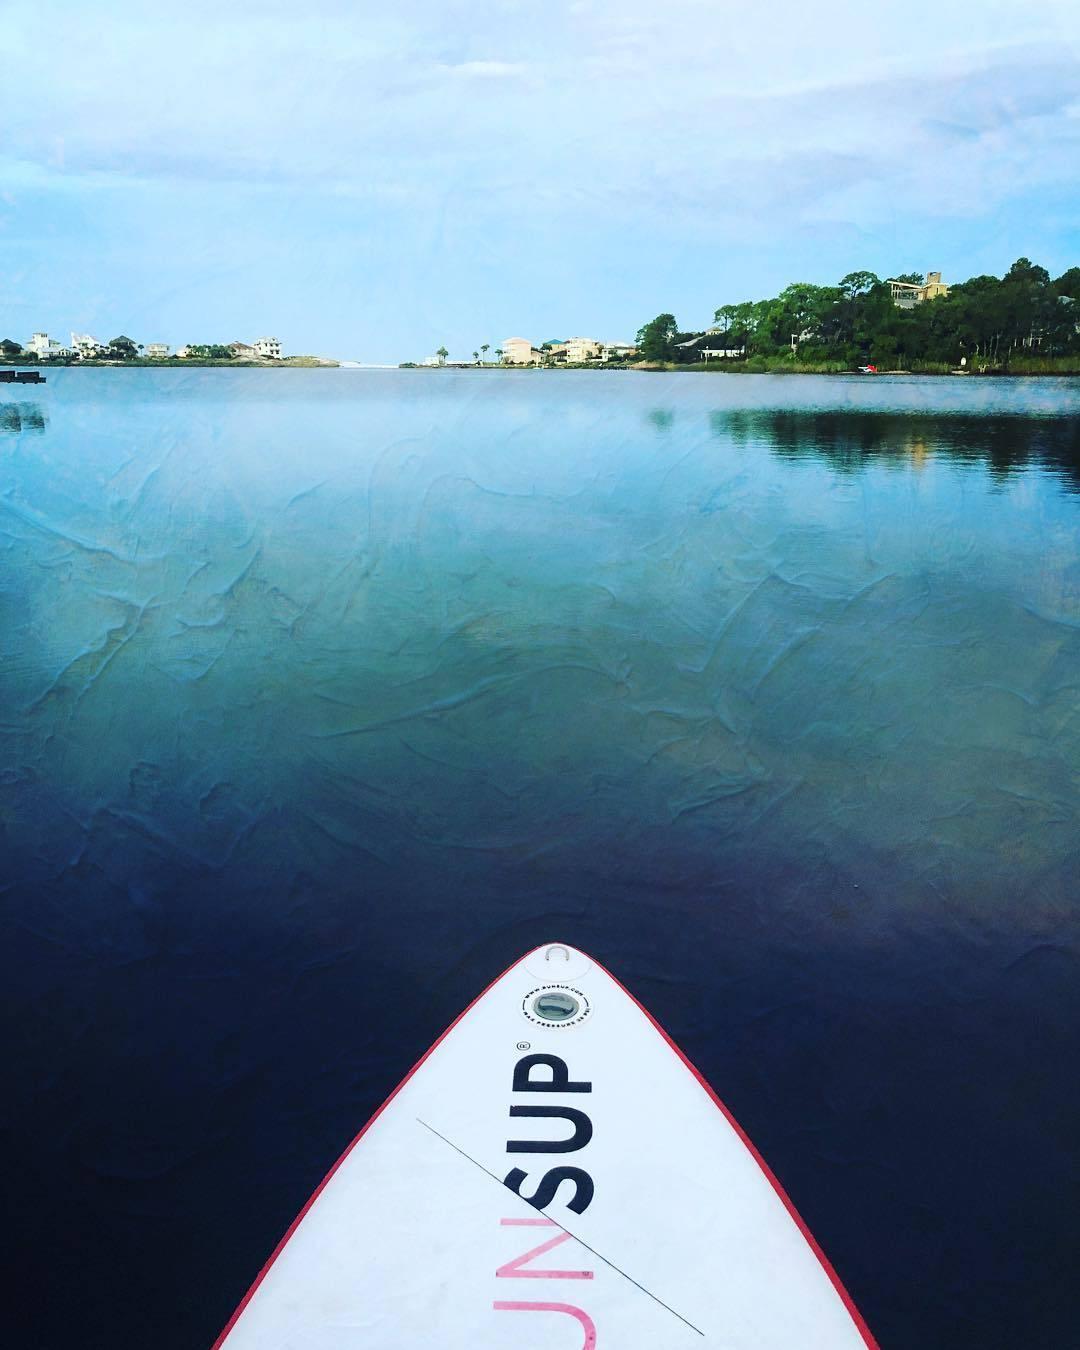 42 Lake Pointe Dr, Santa Rosa Beach, FL 32459